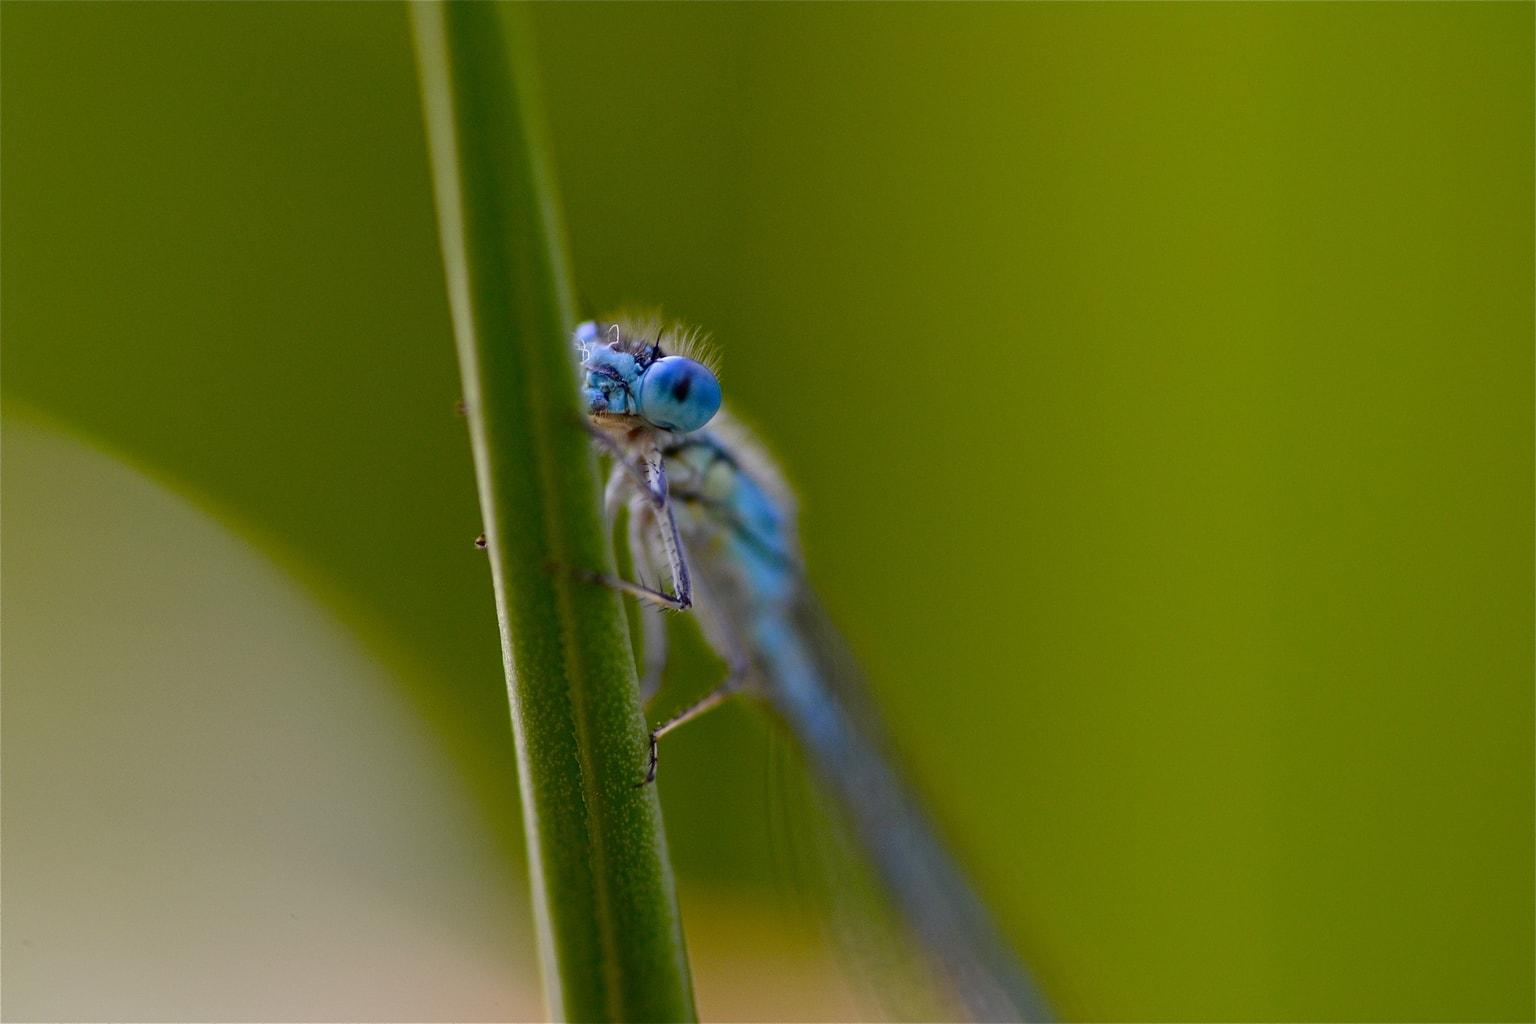 Insecto azul sobre fondo verde